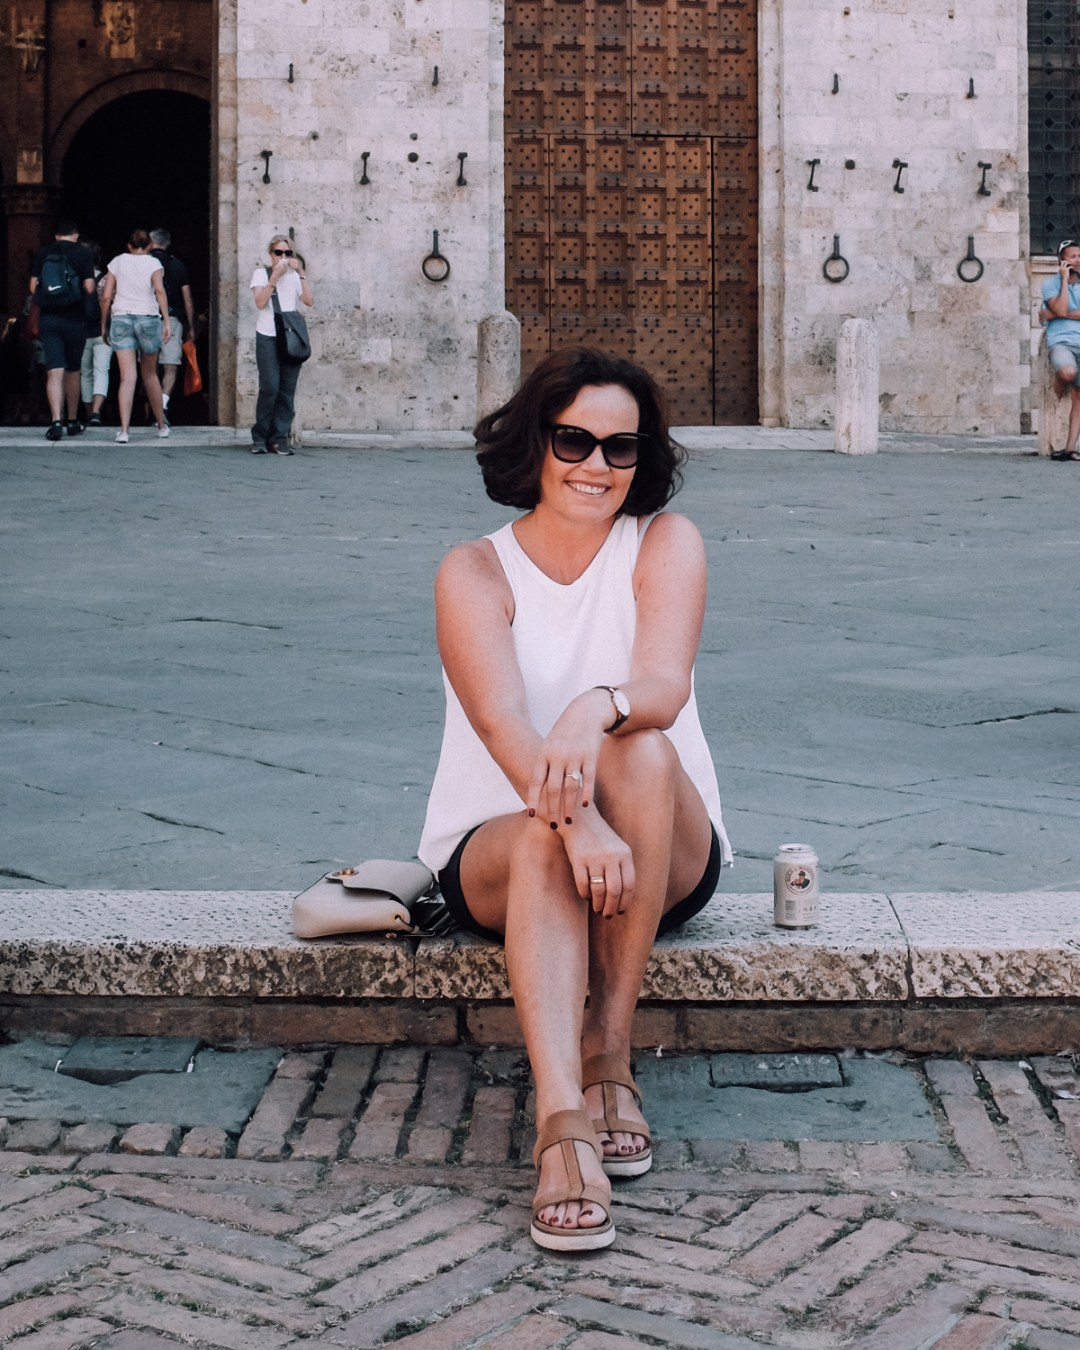 inastil, Ü50Blogger, Reiseblogger, Toskana, Villa, Florenz, Siena, Certaldo, Lifestyle, Italienreise, Italienliebe, Cabriotour-13